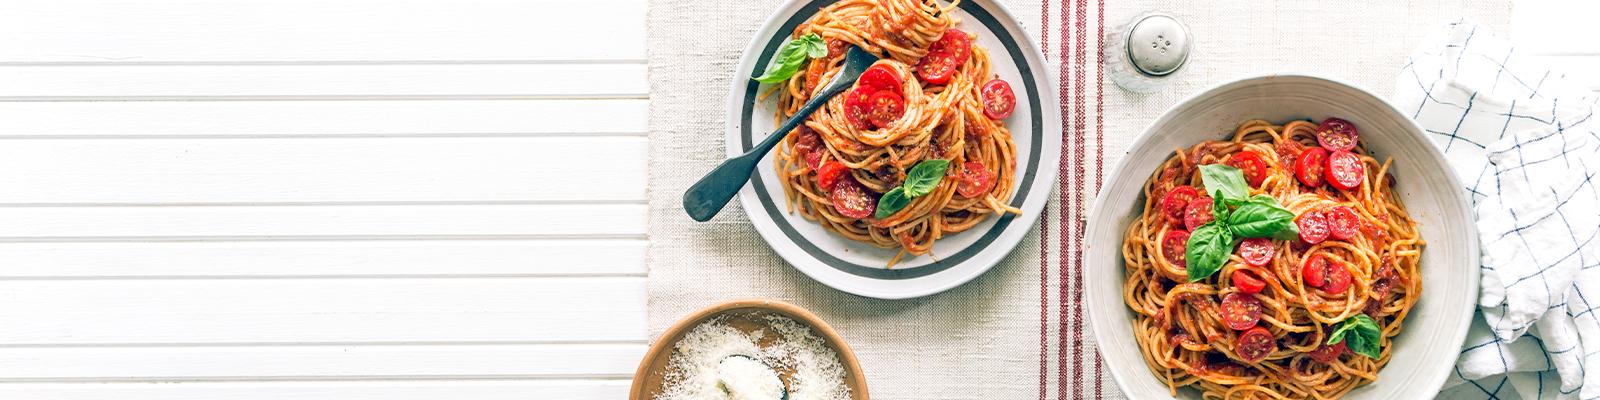 Pasta Garofalo - Produits de tomates